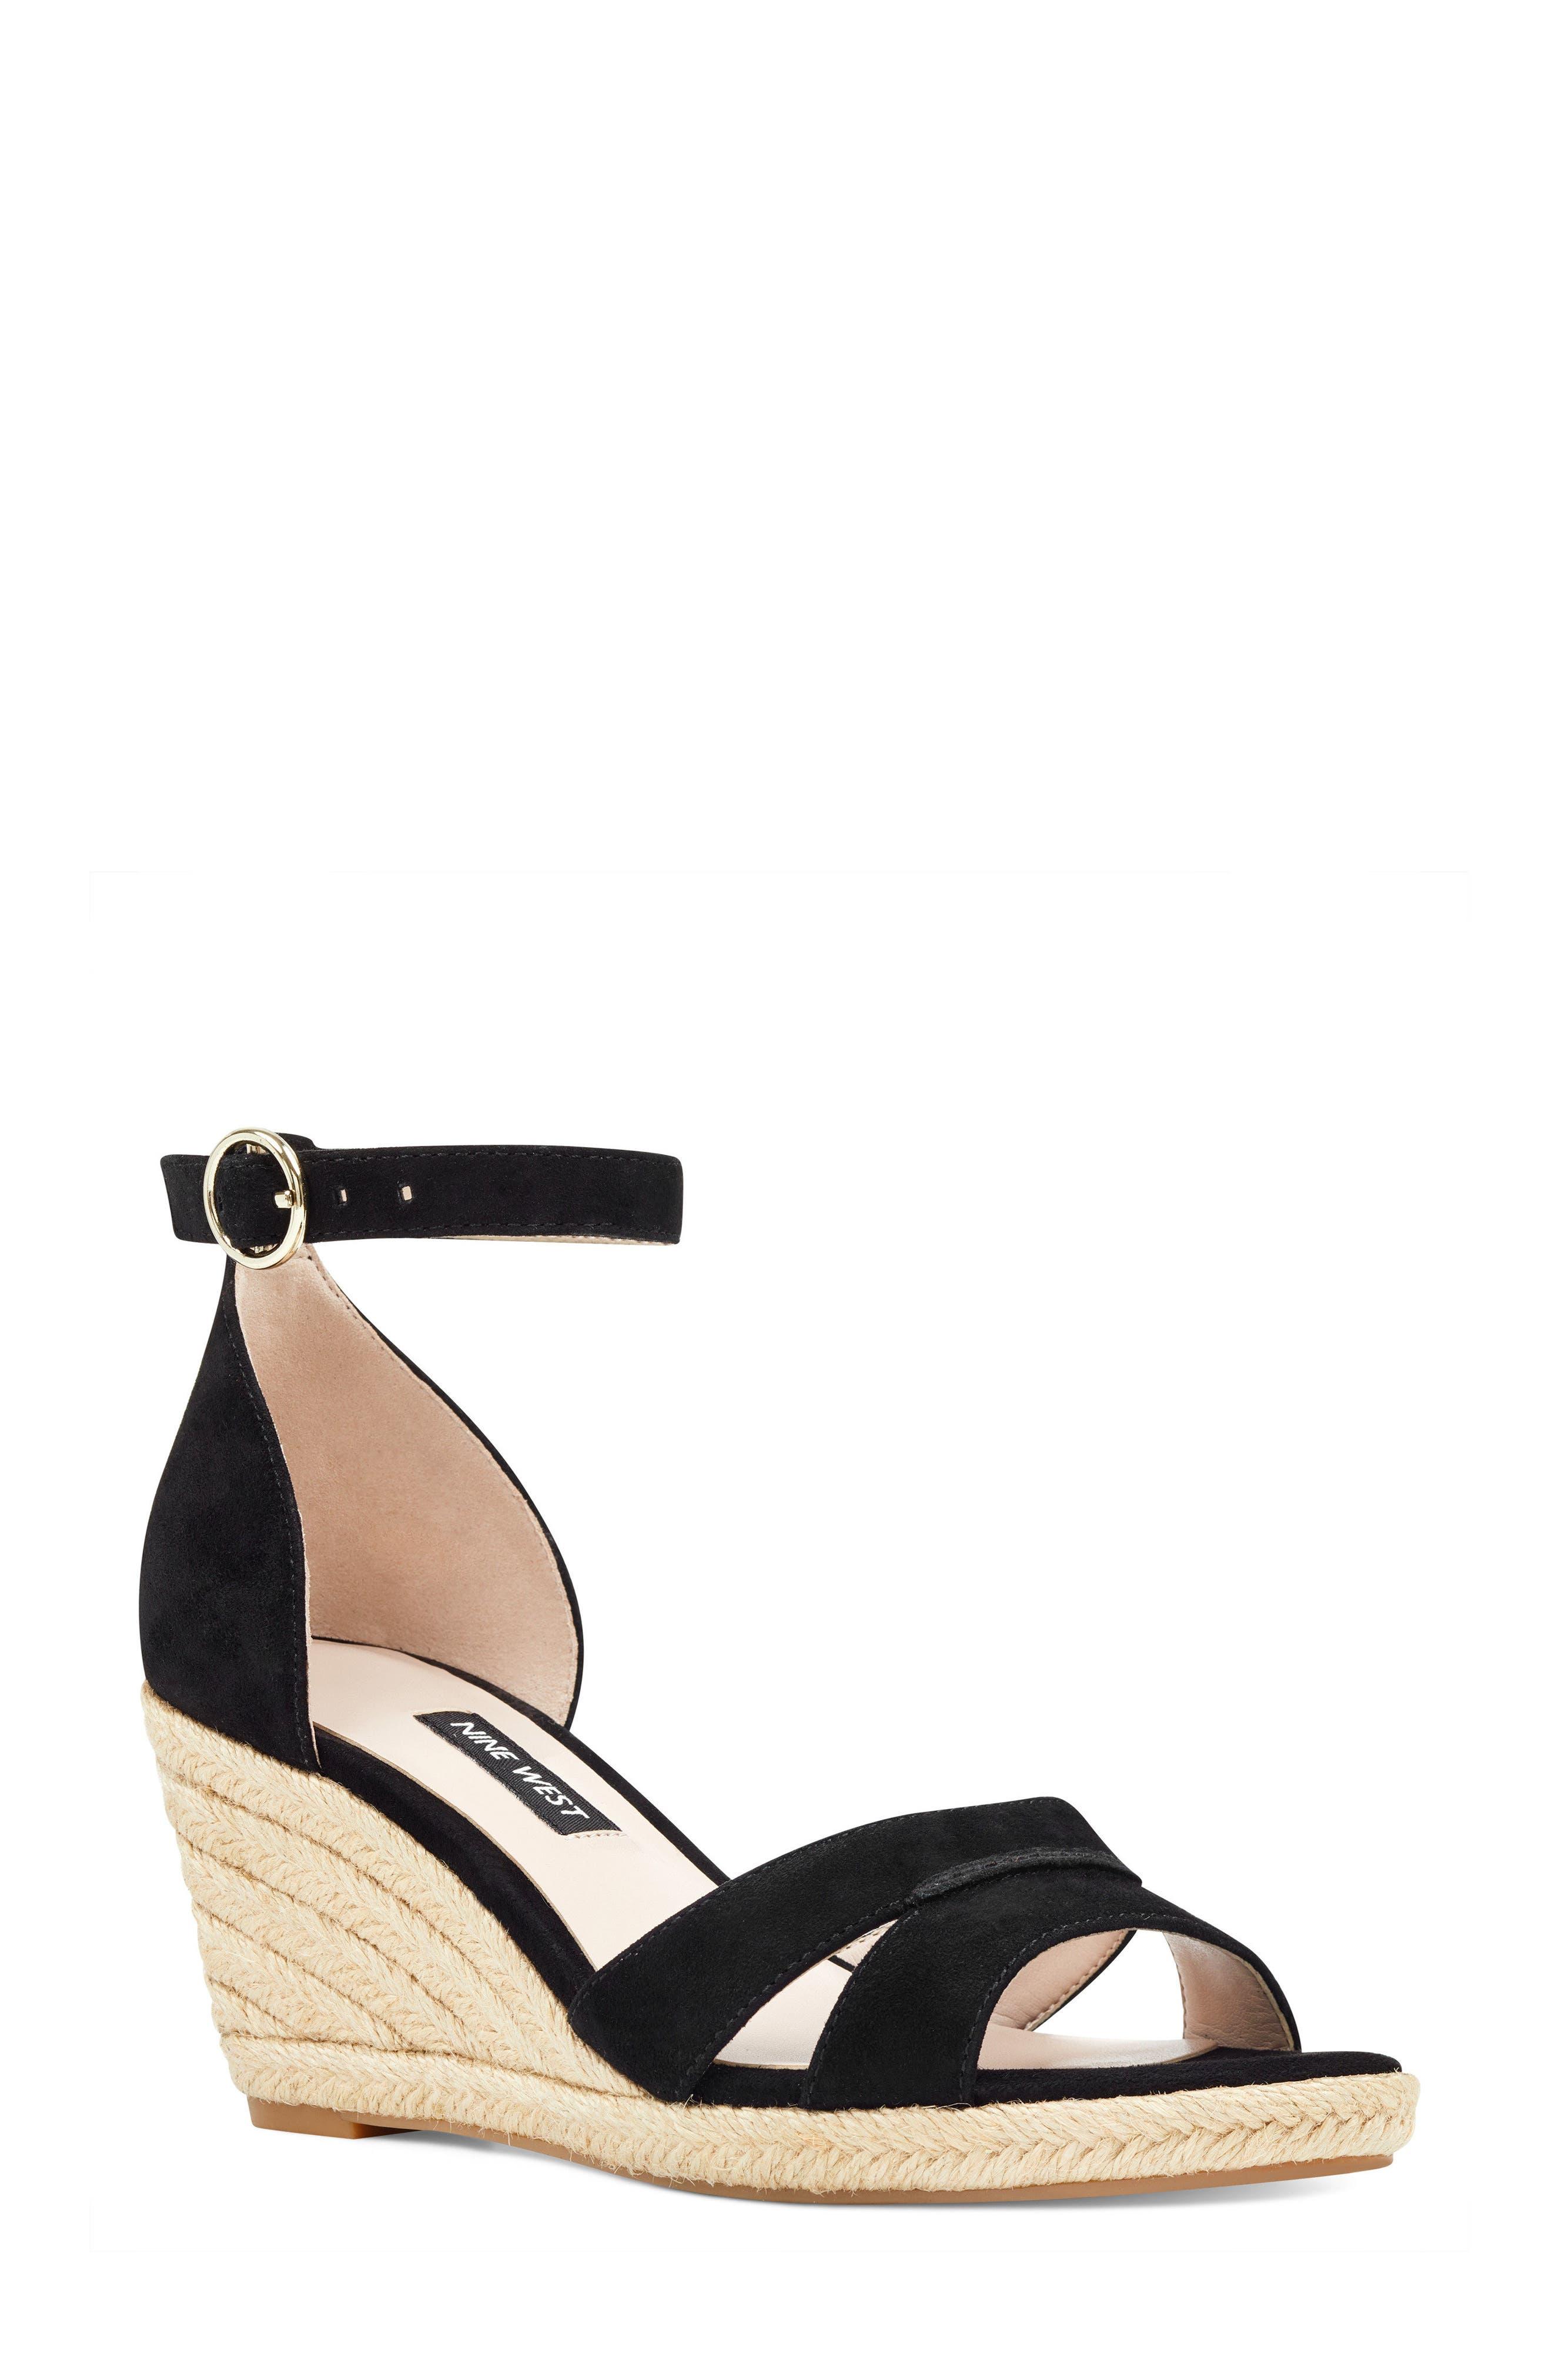 Jeranna Espadrille Wedge Sandal,                         Main,                         color, 001